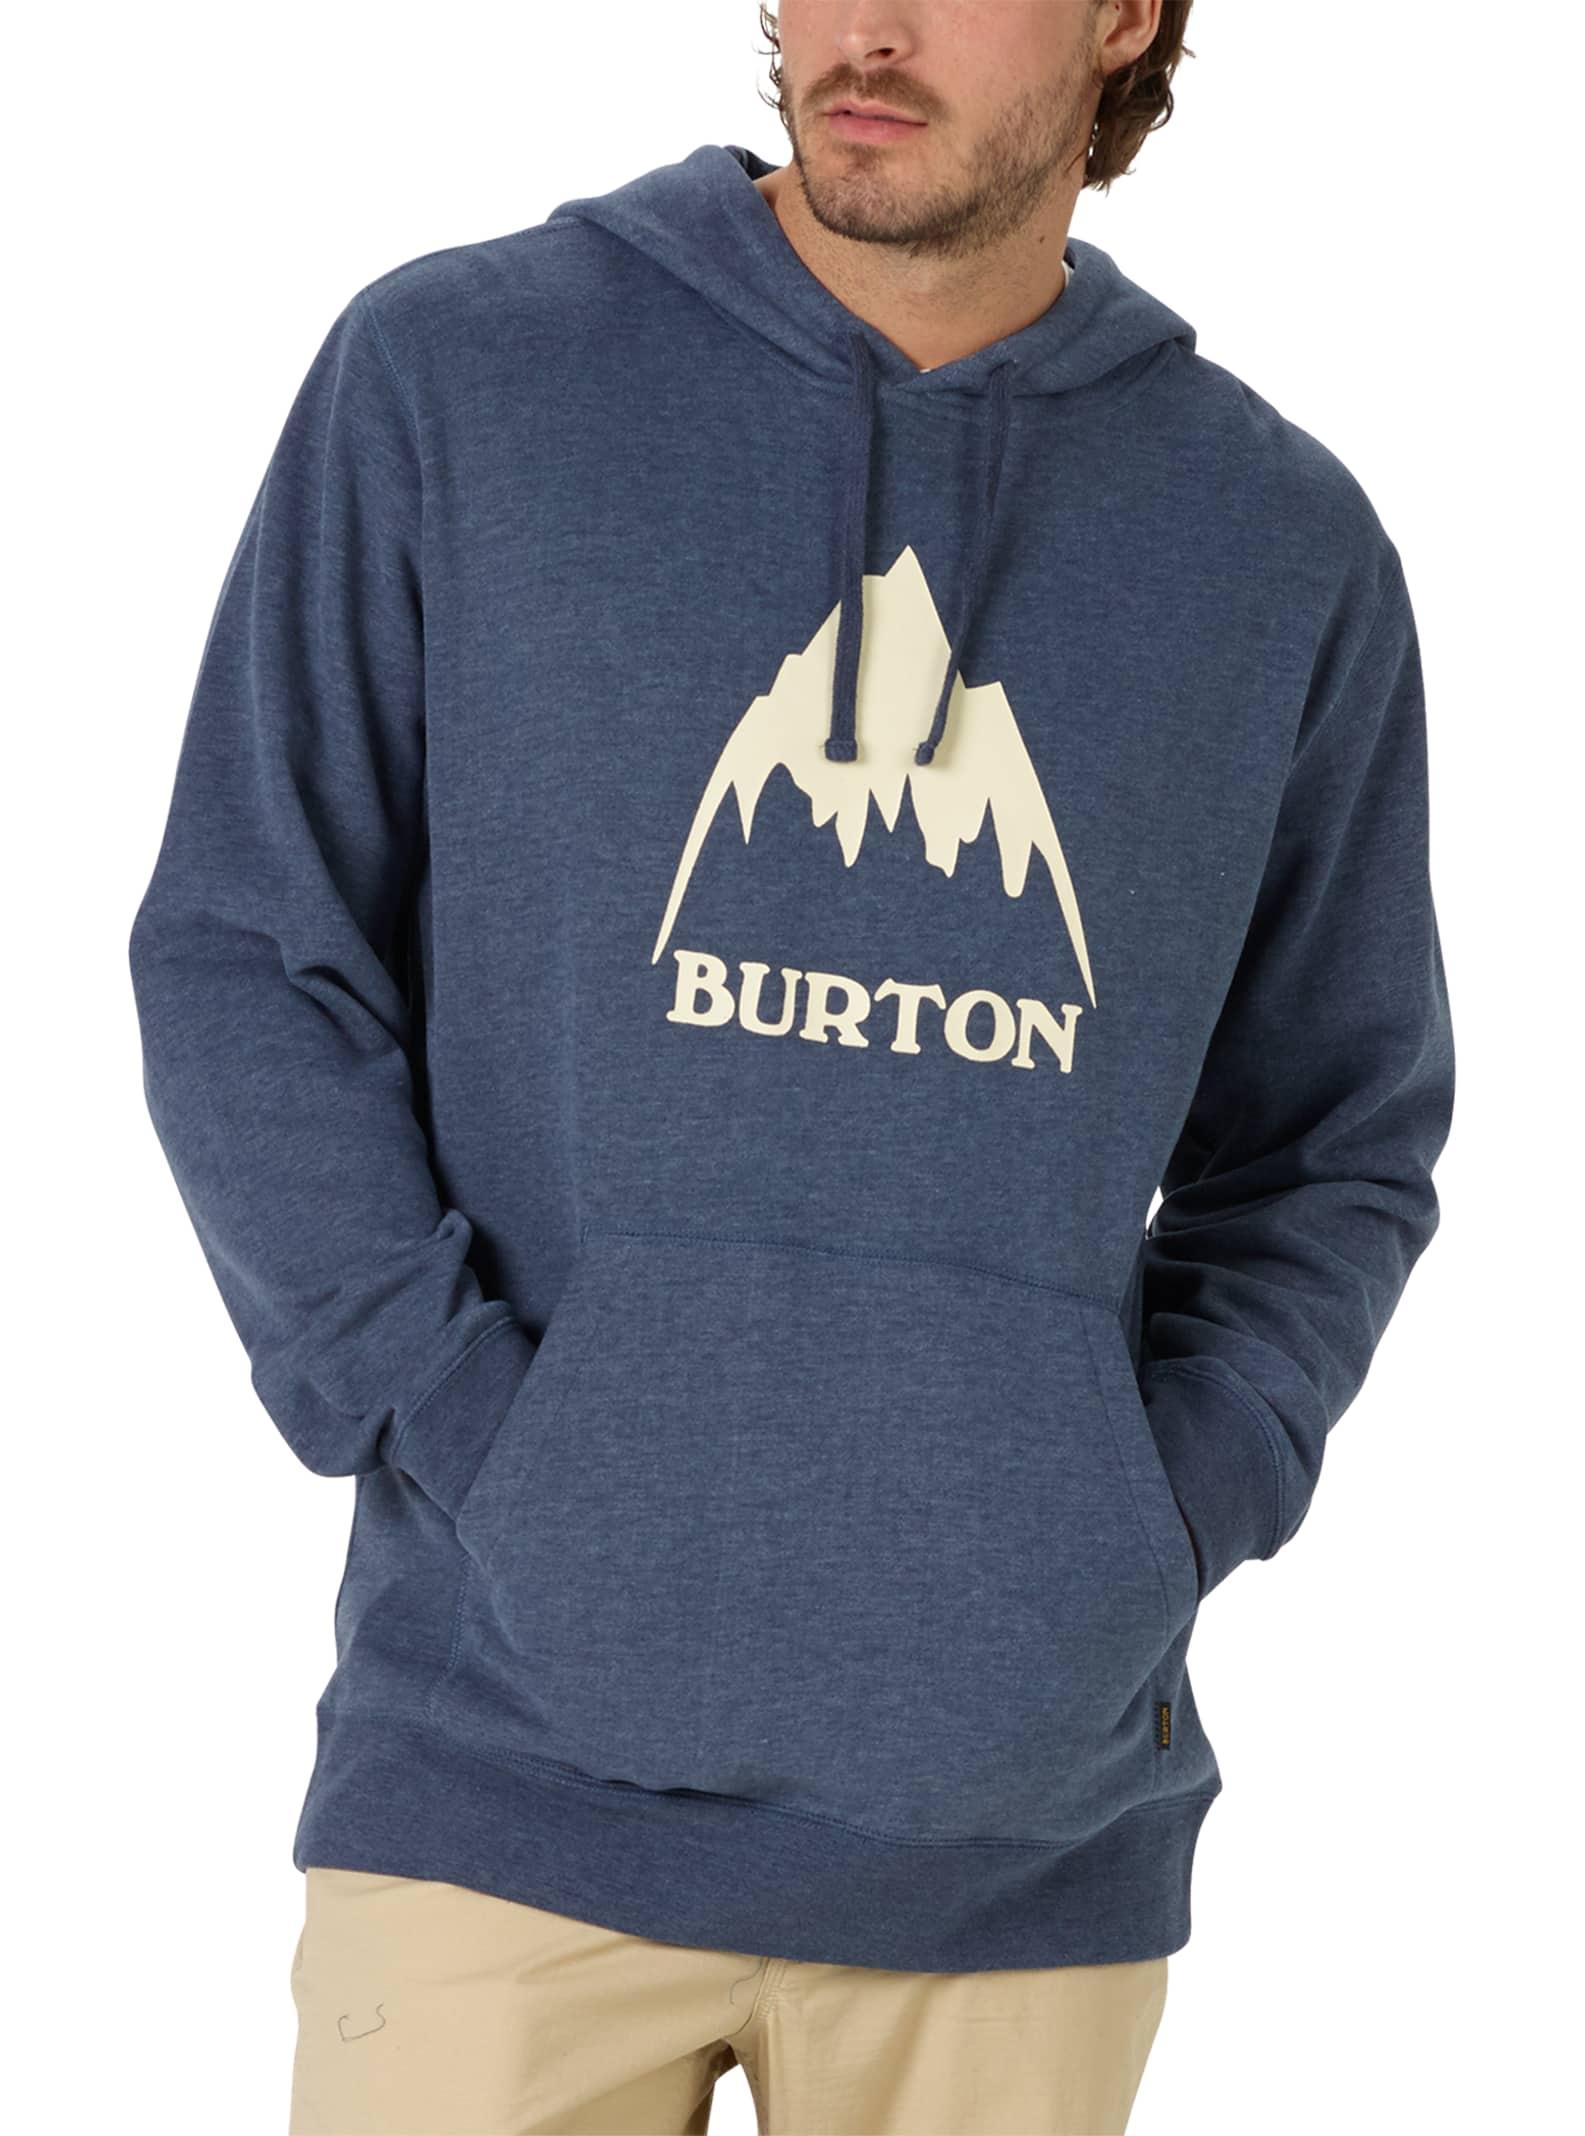 mens hoodie bronx blend on snowboard gear special burton snowboards greyskull images jacket best jackets tylernetter pinterest sleeper